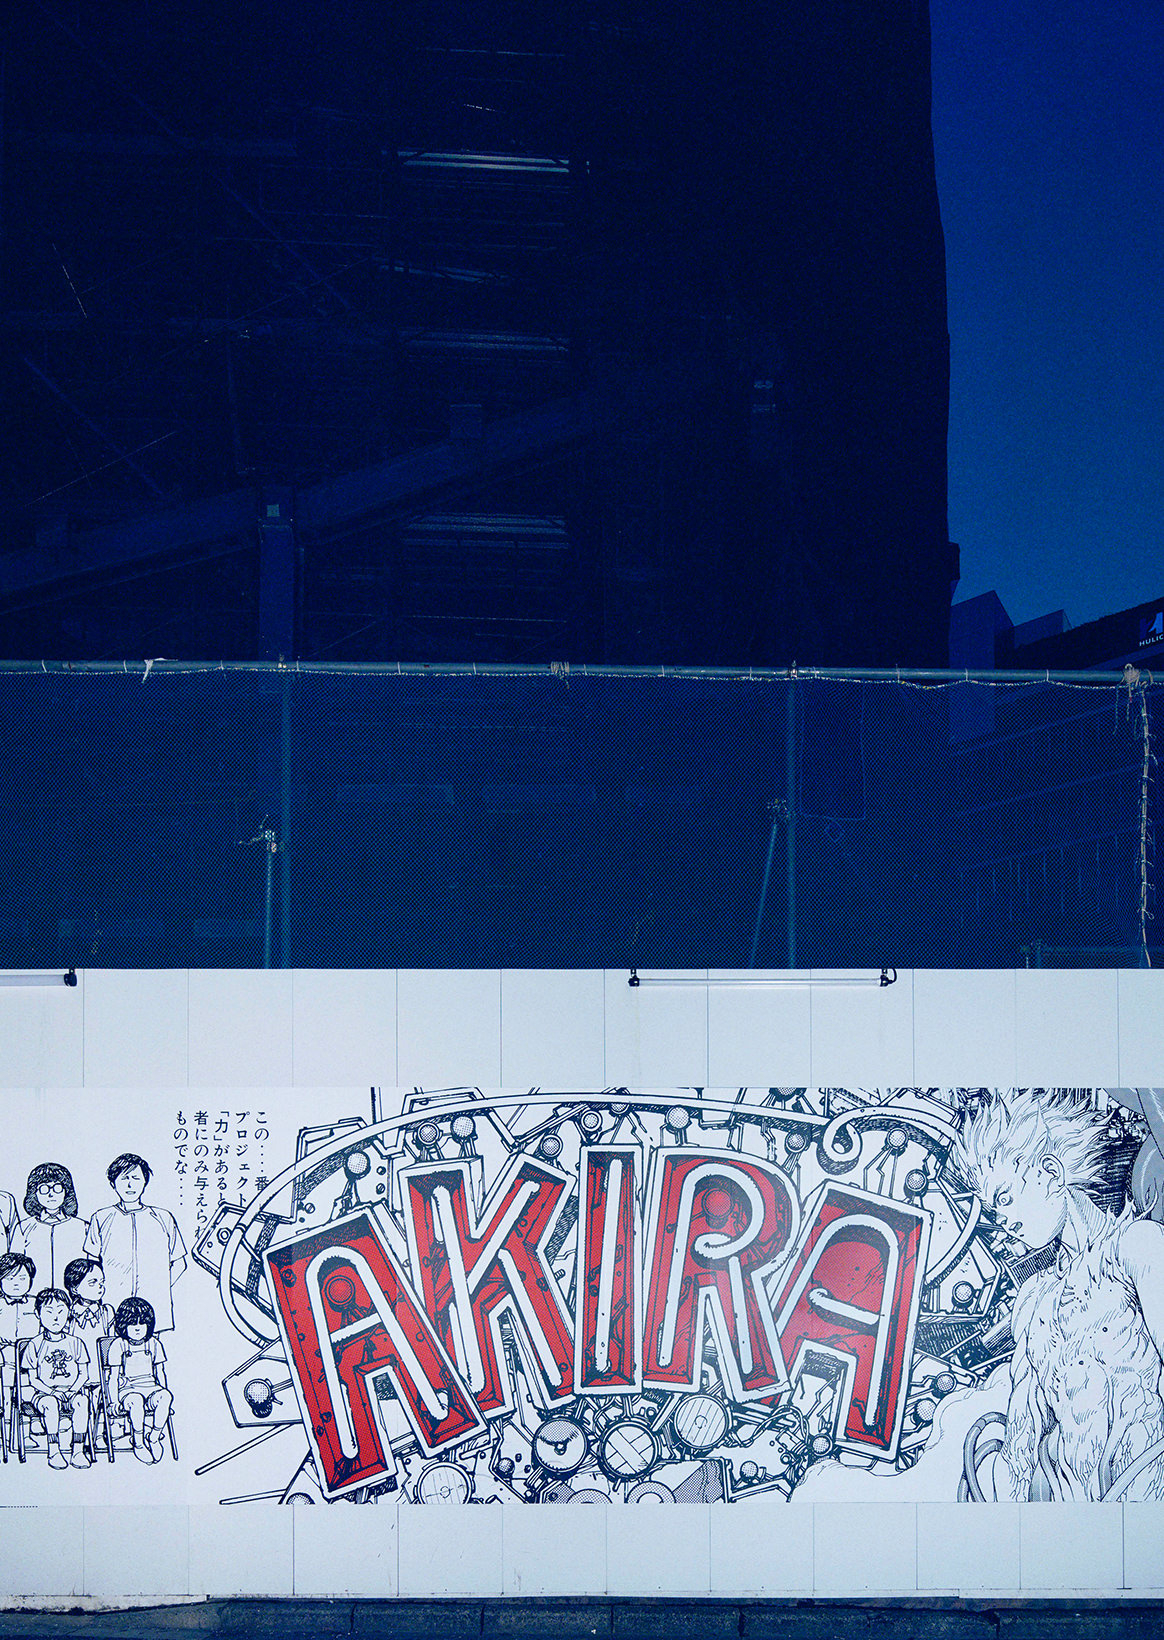 Art Wall อะคิระฟื้นคืนที่ชิบุยะ อะคิระ ART OF WALL Otomo Katsuhiro วาตู Kosuke Kawamura อะคิระ ART EXHIBITION